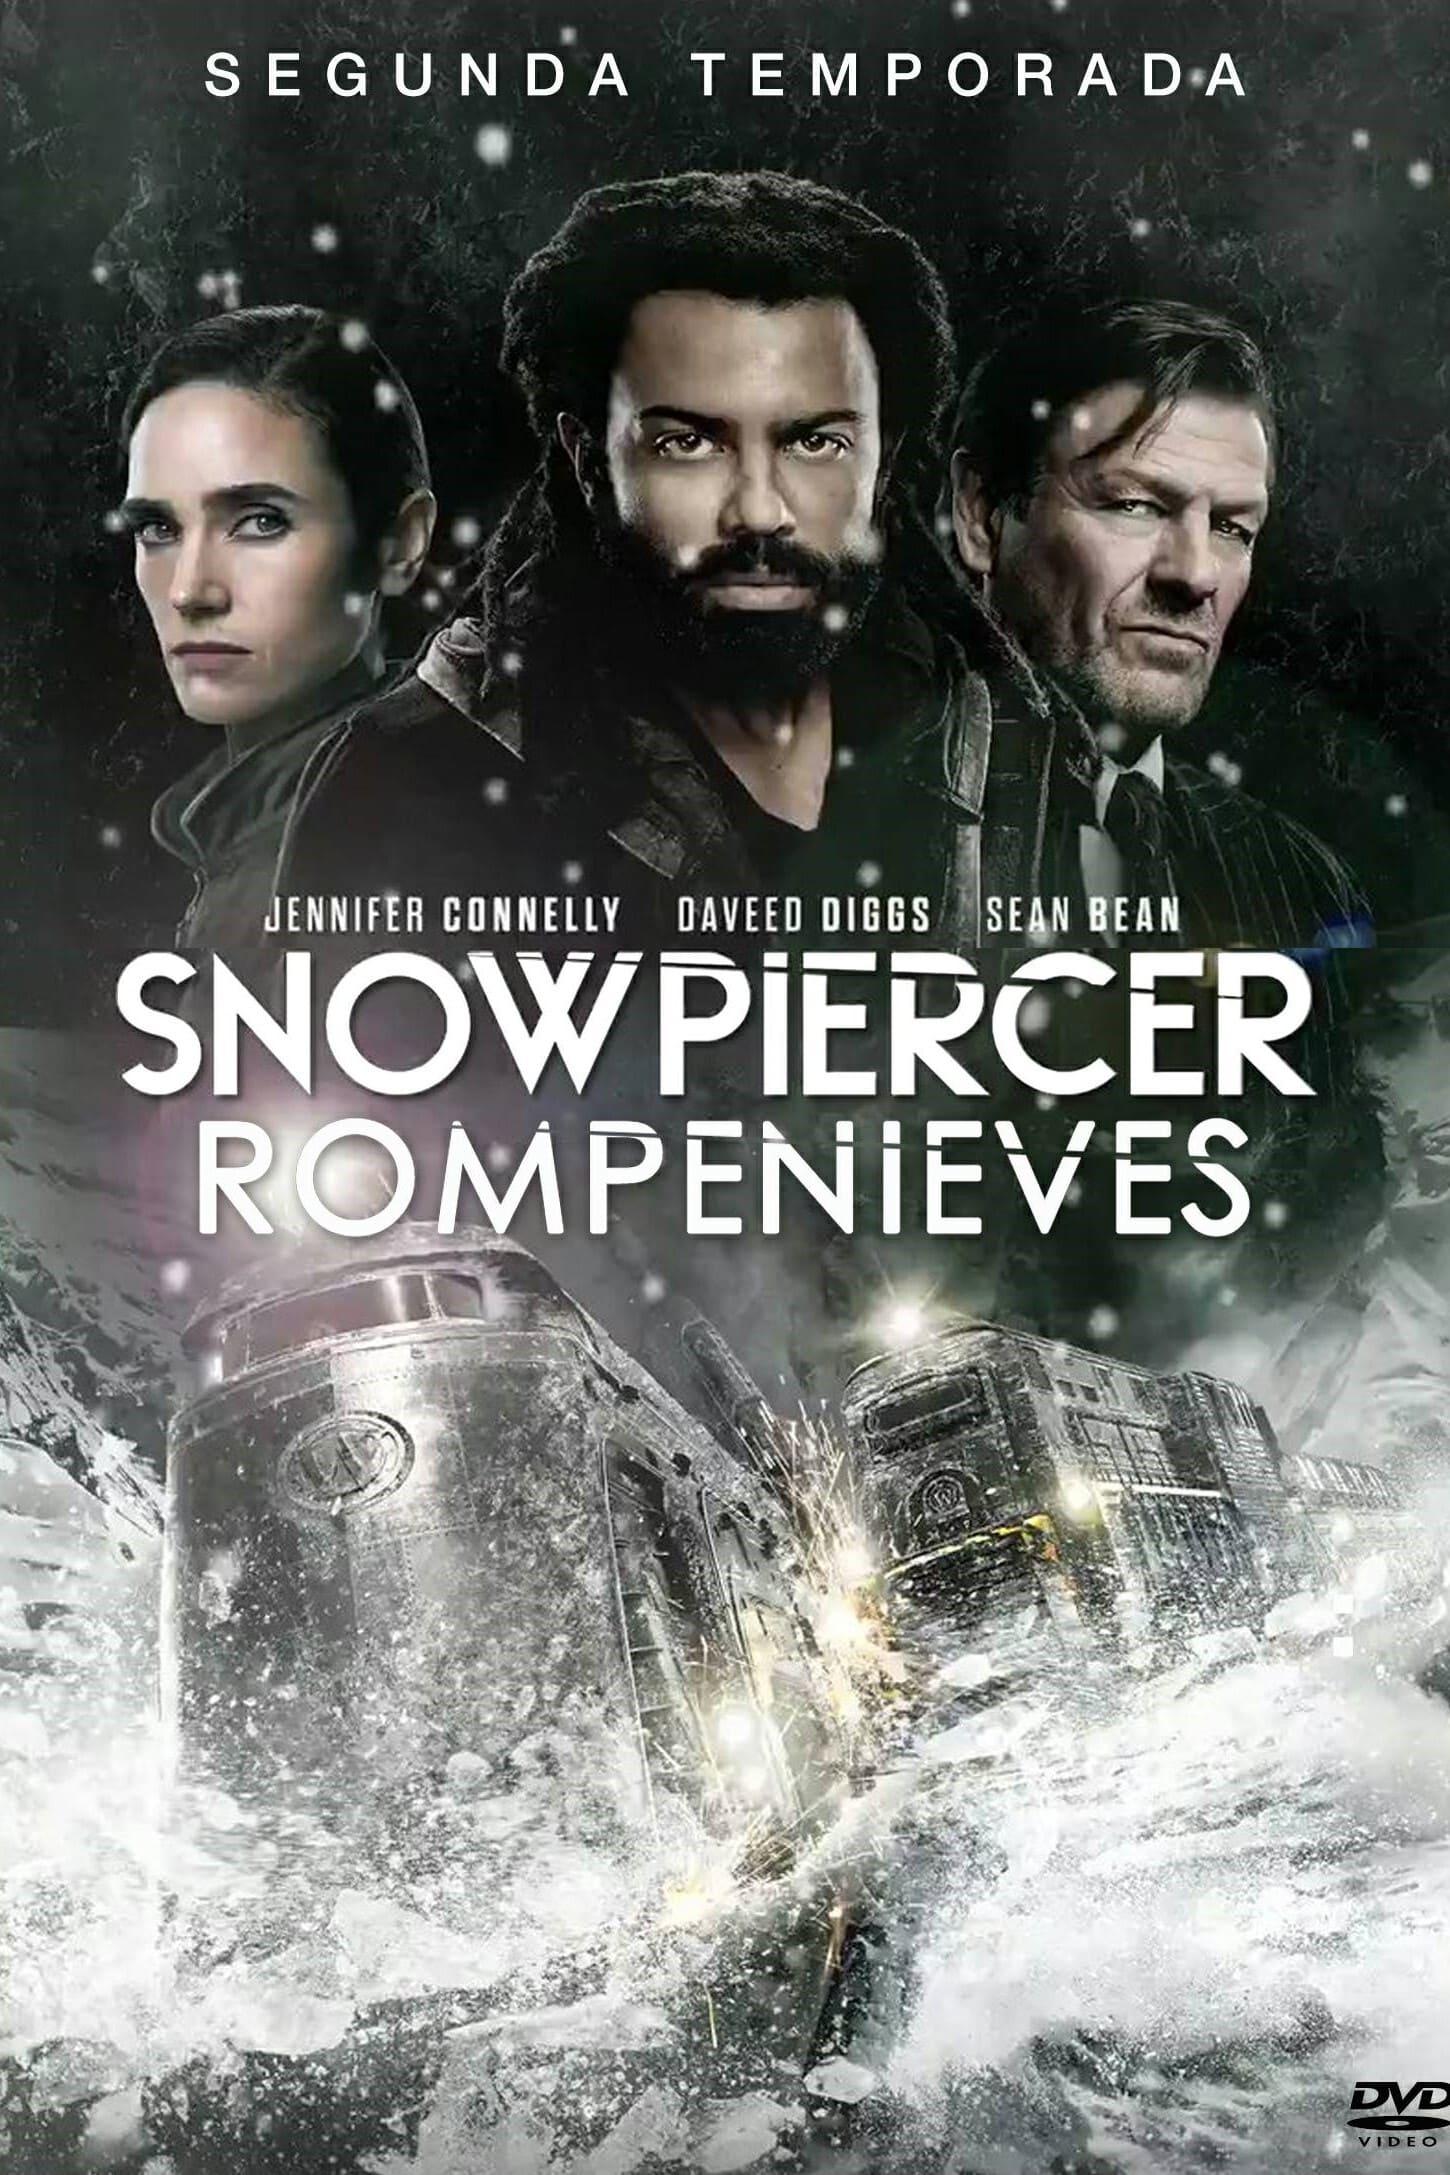 Snowpiercer: Rompenieves poster